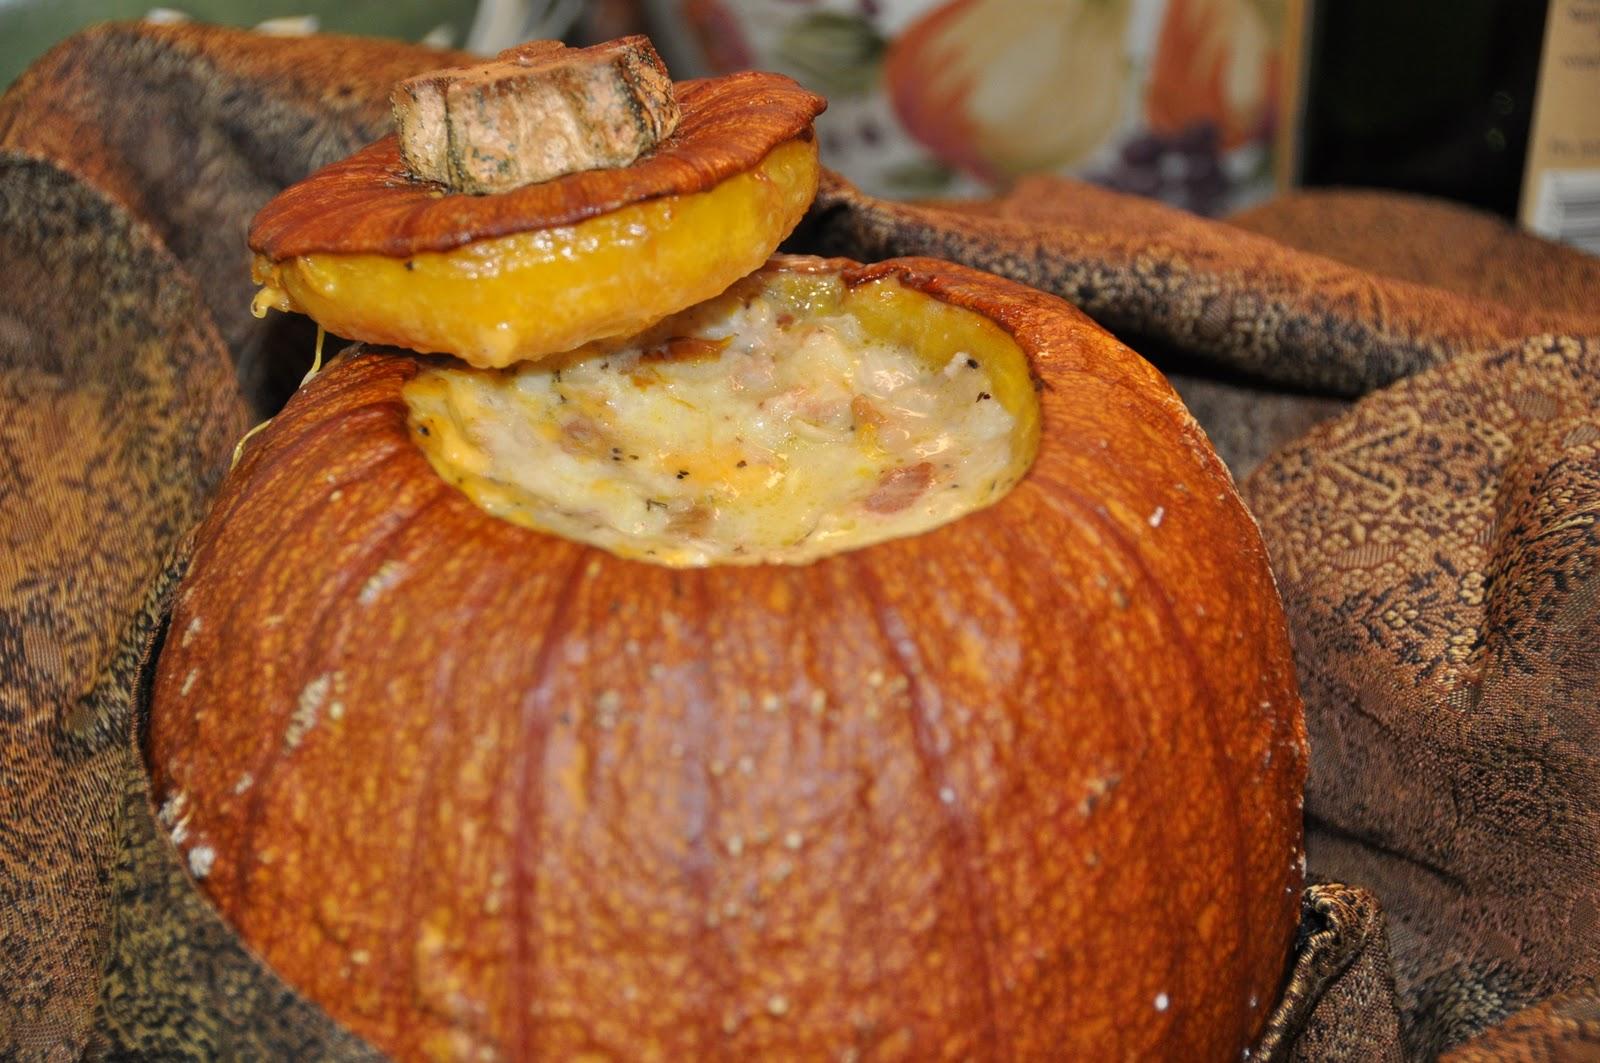 heard about this stuffed pumpkin recipe on npr as dorie greenspan ...